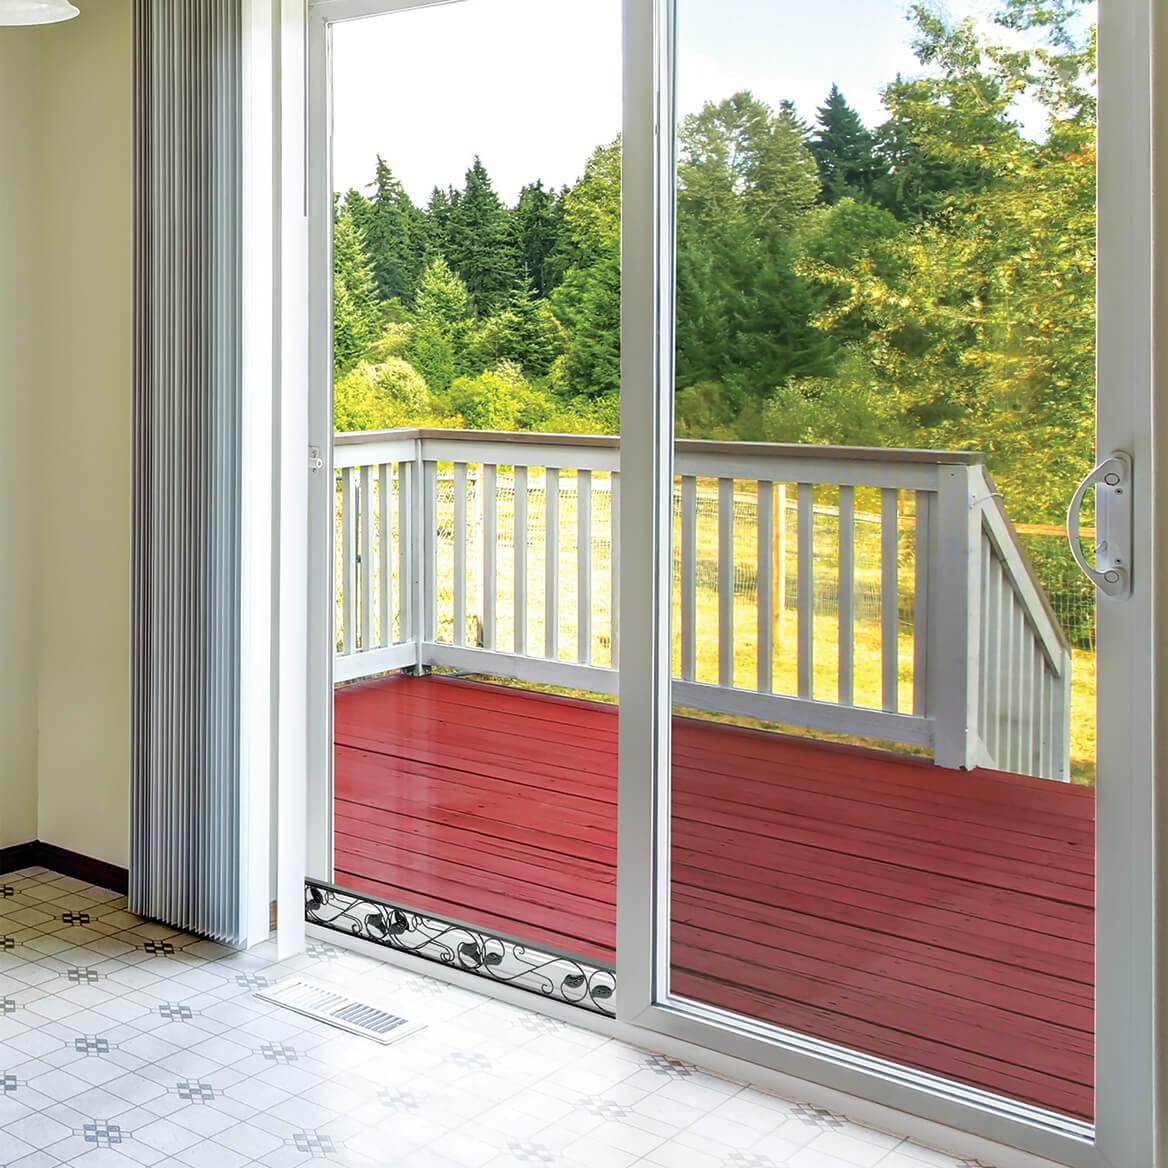 Decorative Sliding Door Security Bar Black-362982